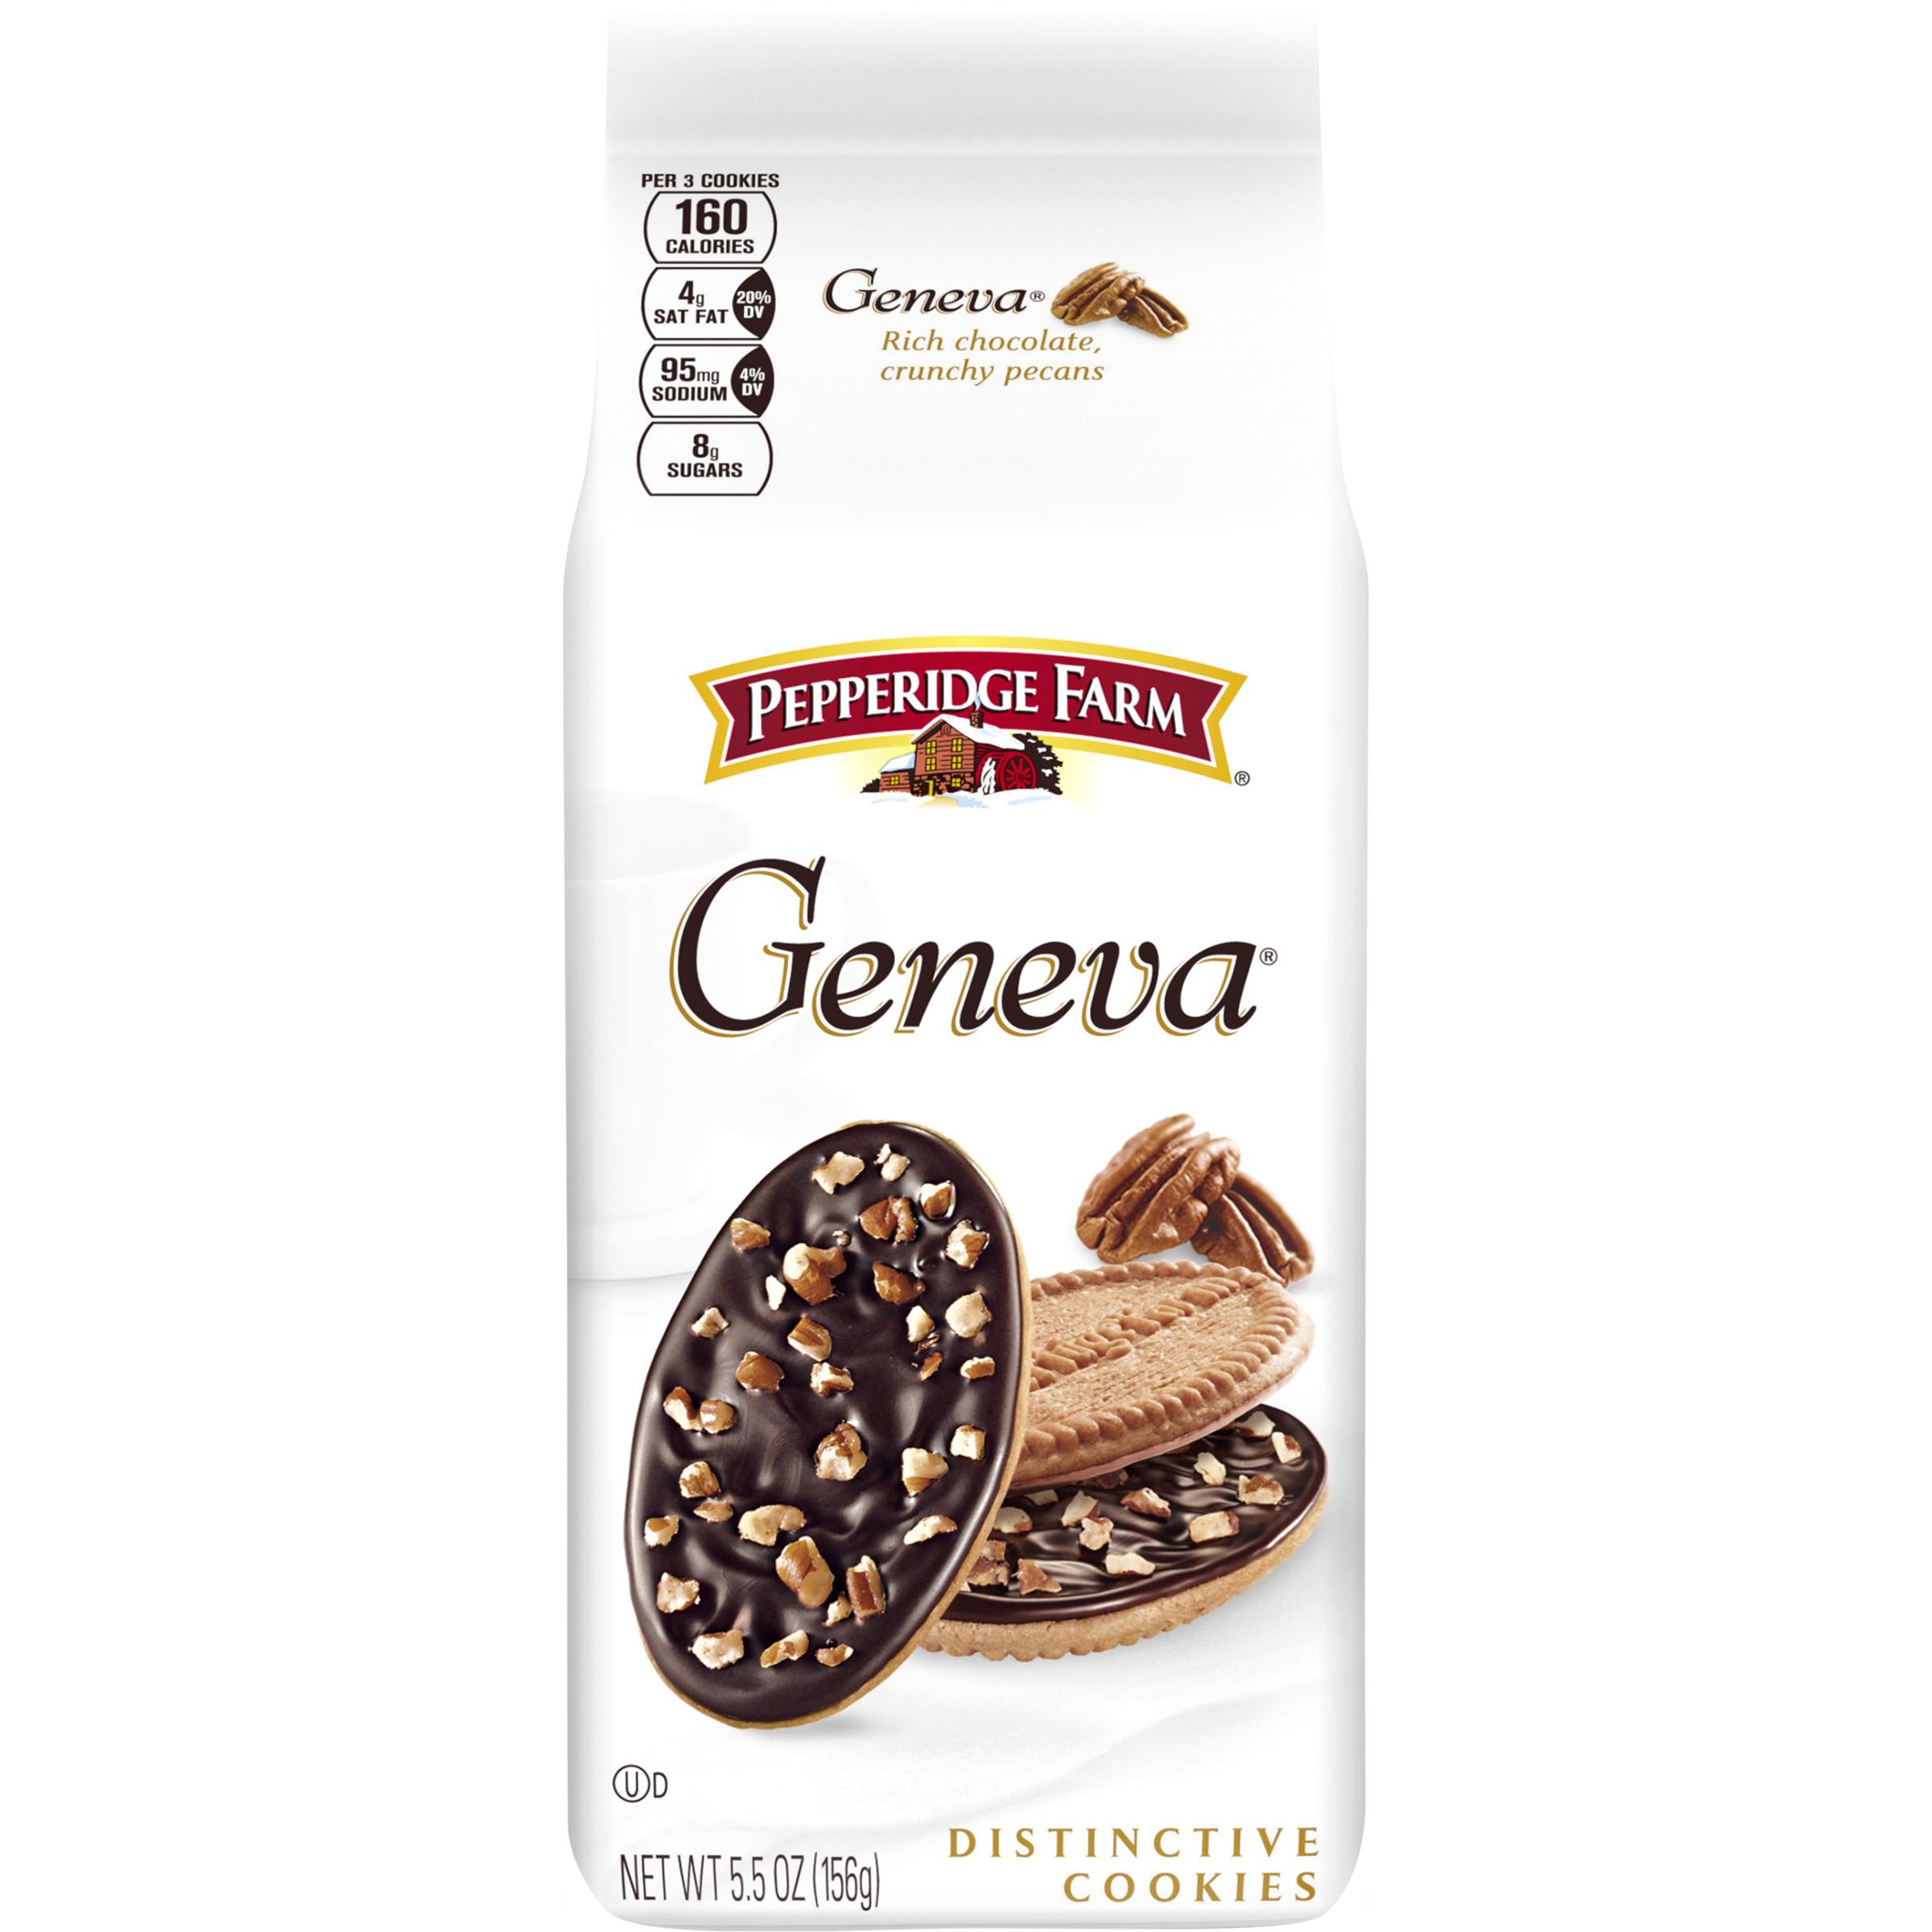 pepperidge farm geneva chocolate pecan covered cookies 5 5 oz bag walmart com